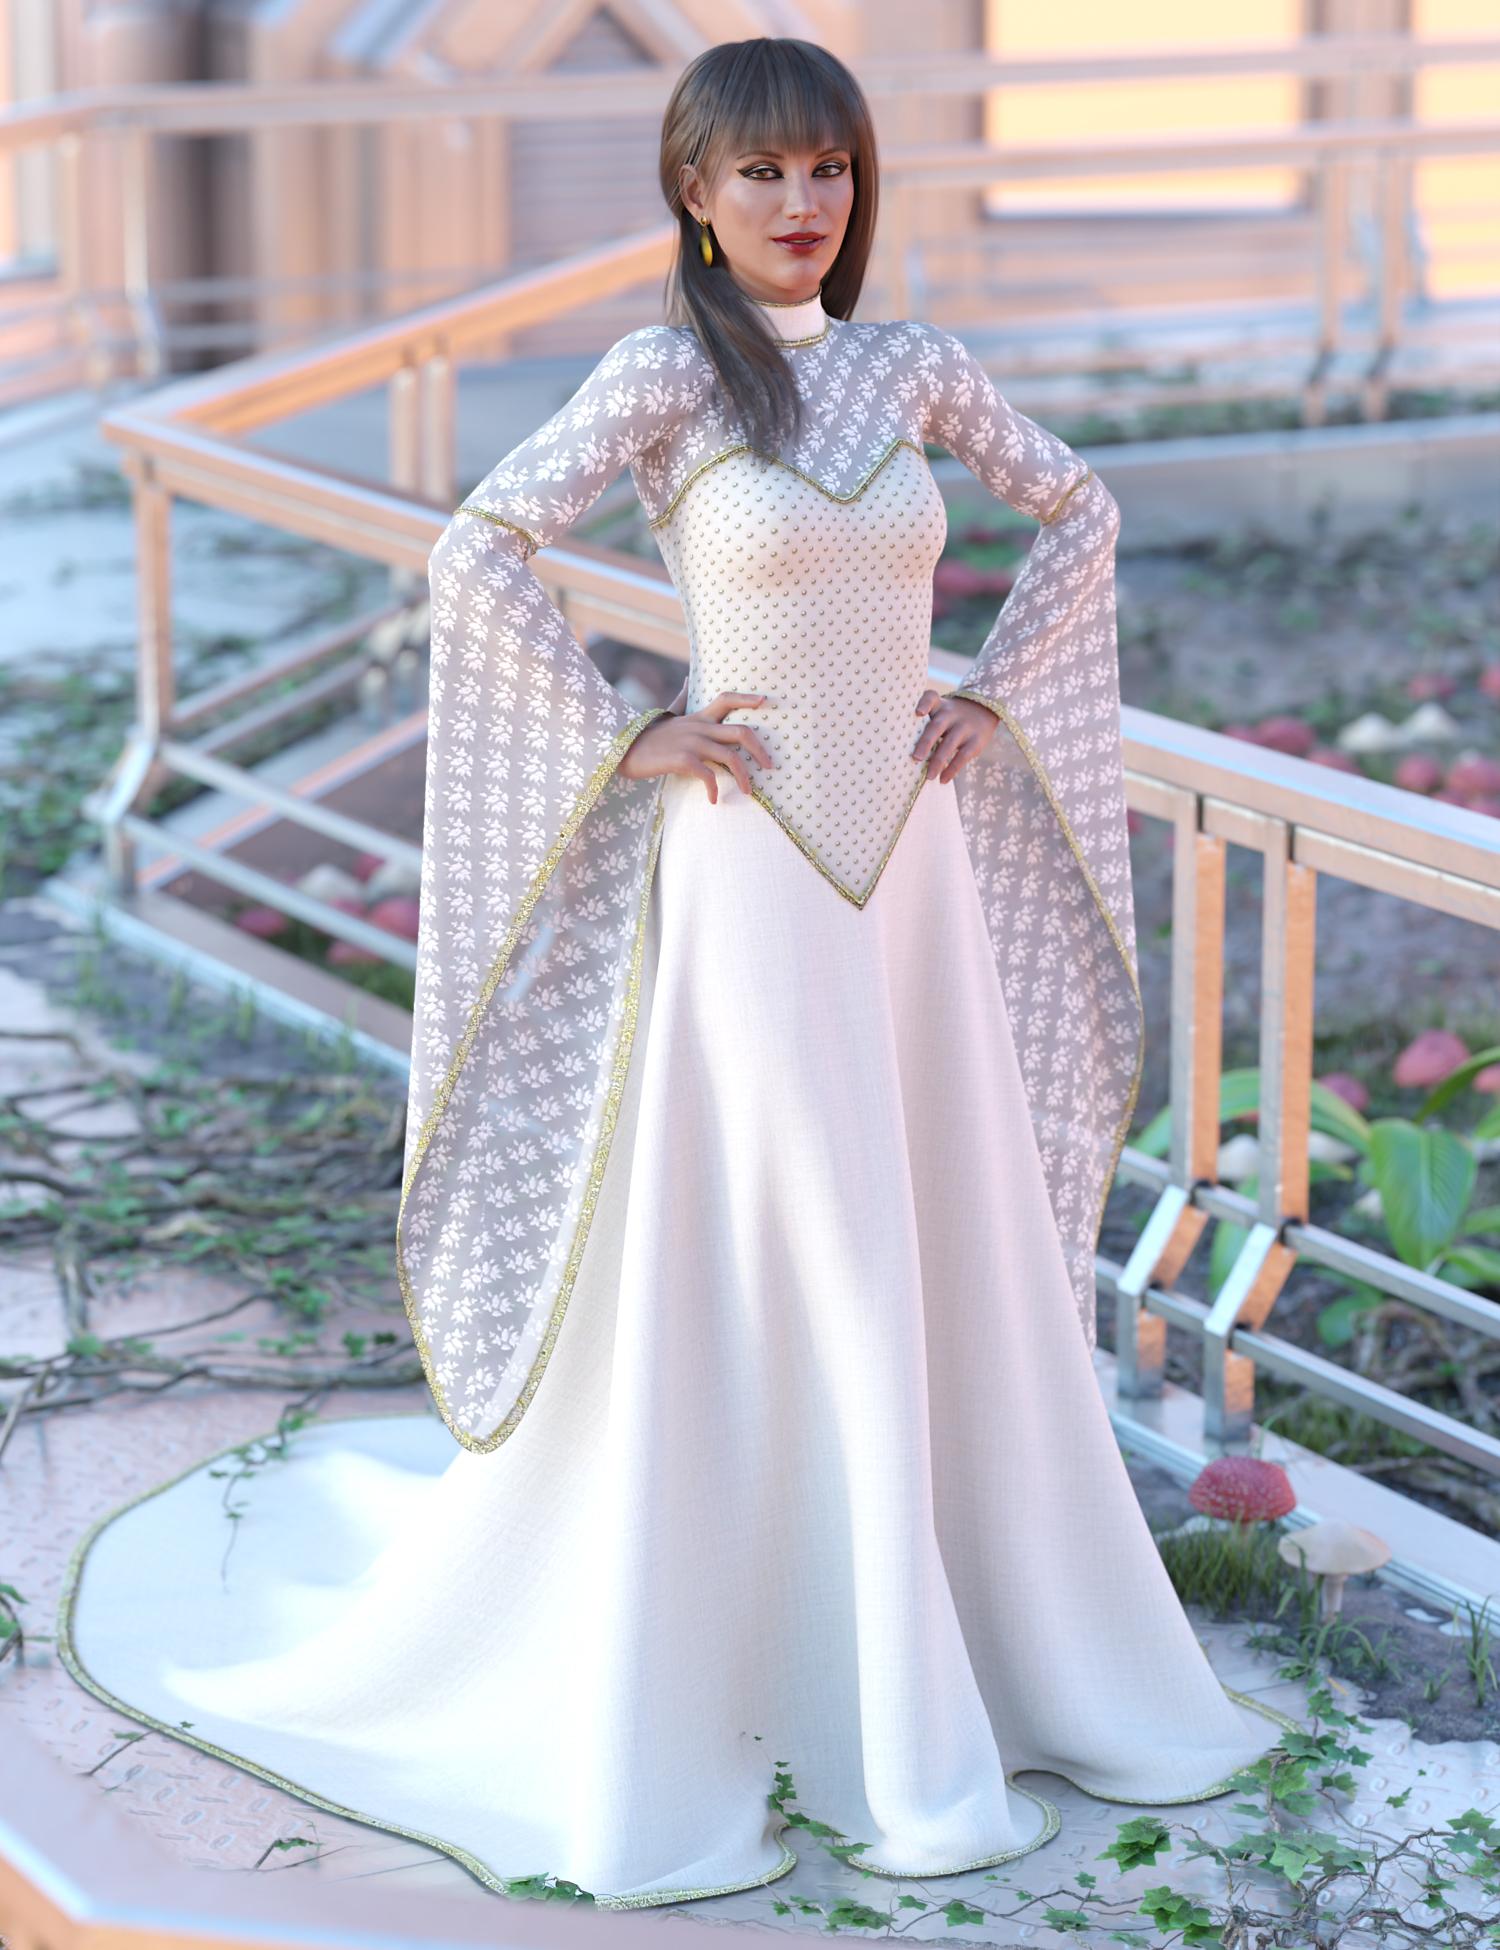 dForce Universal Dress for Genesis 8 Female(s) by: Ravenhair, 3D Models by Daz 3D